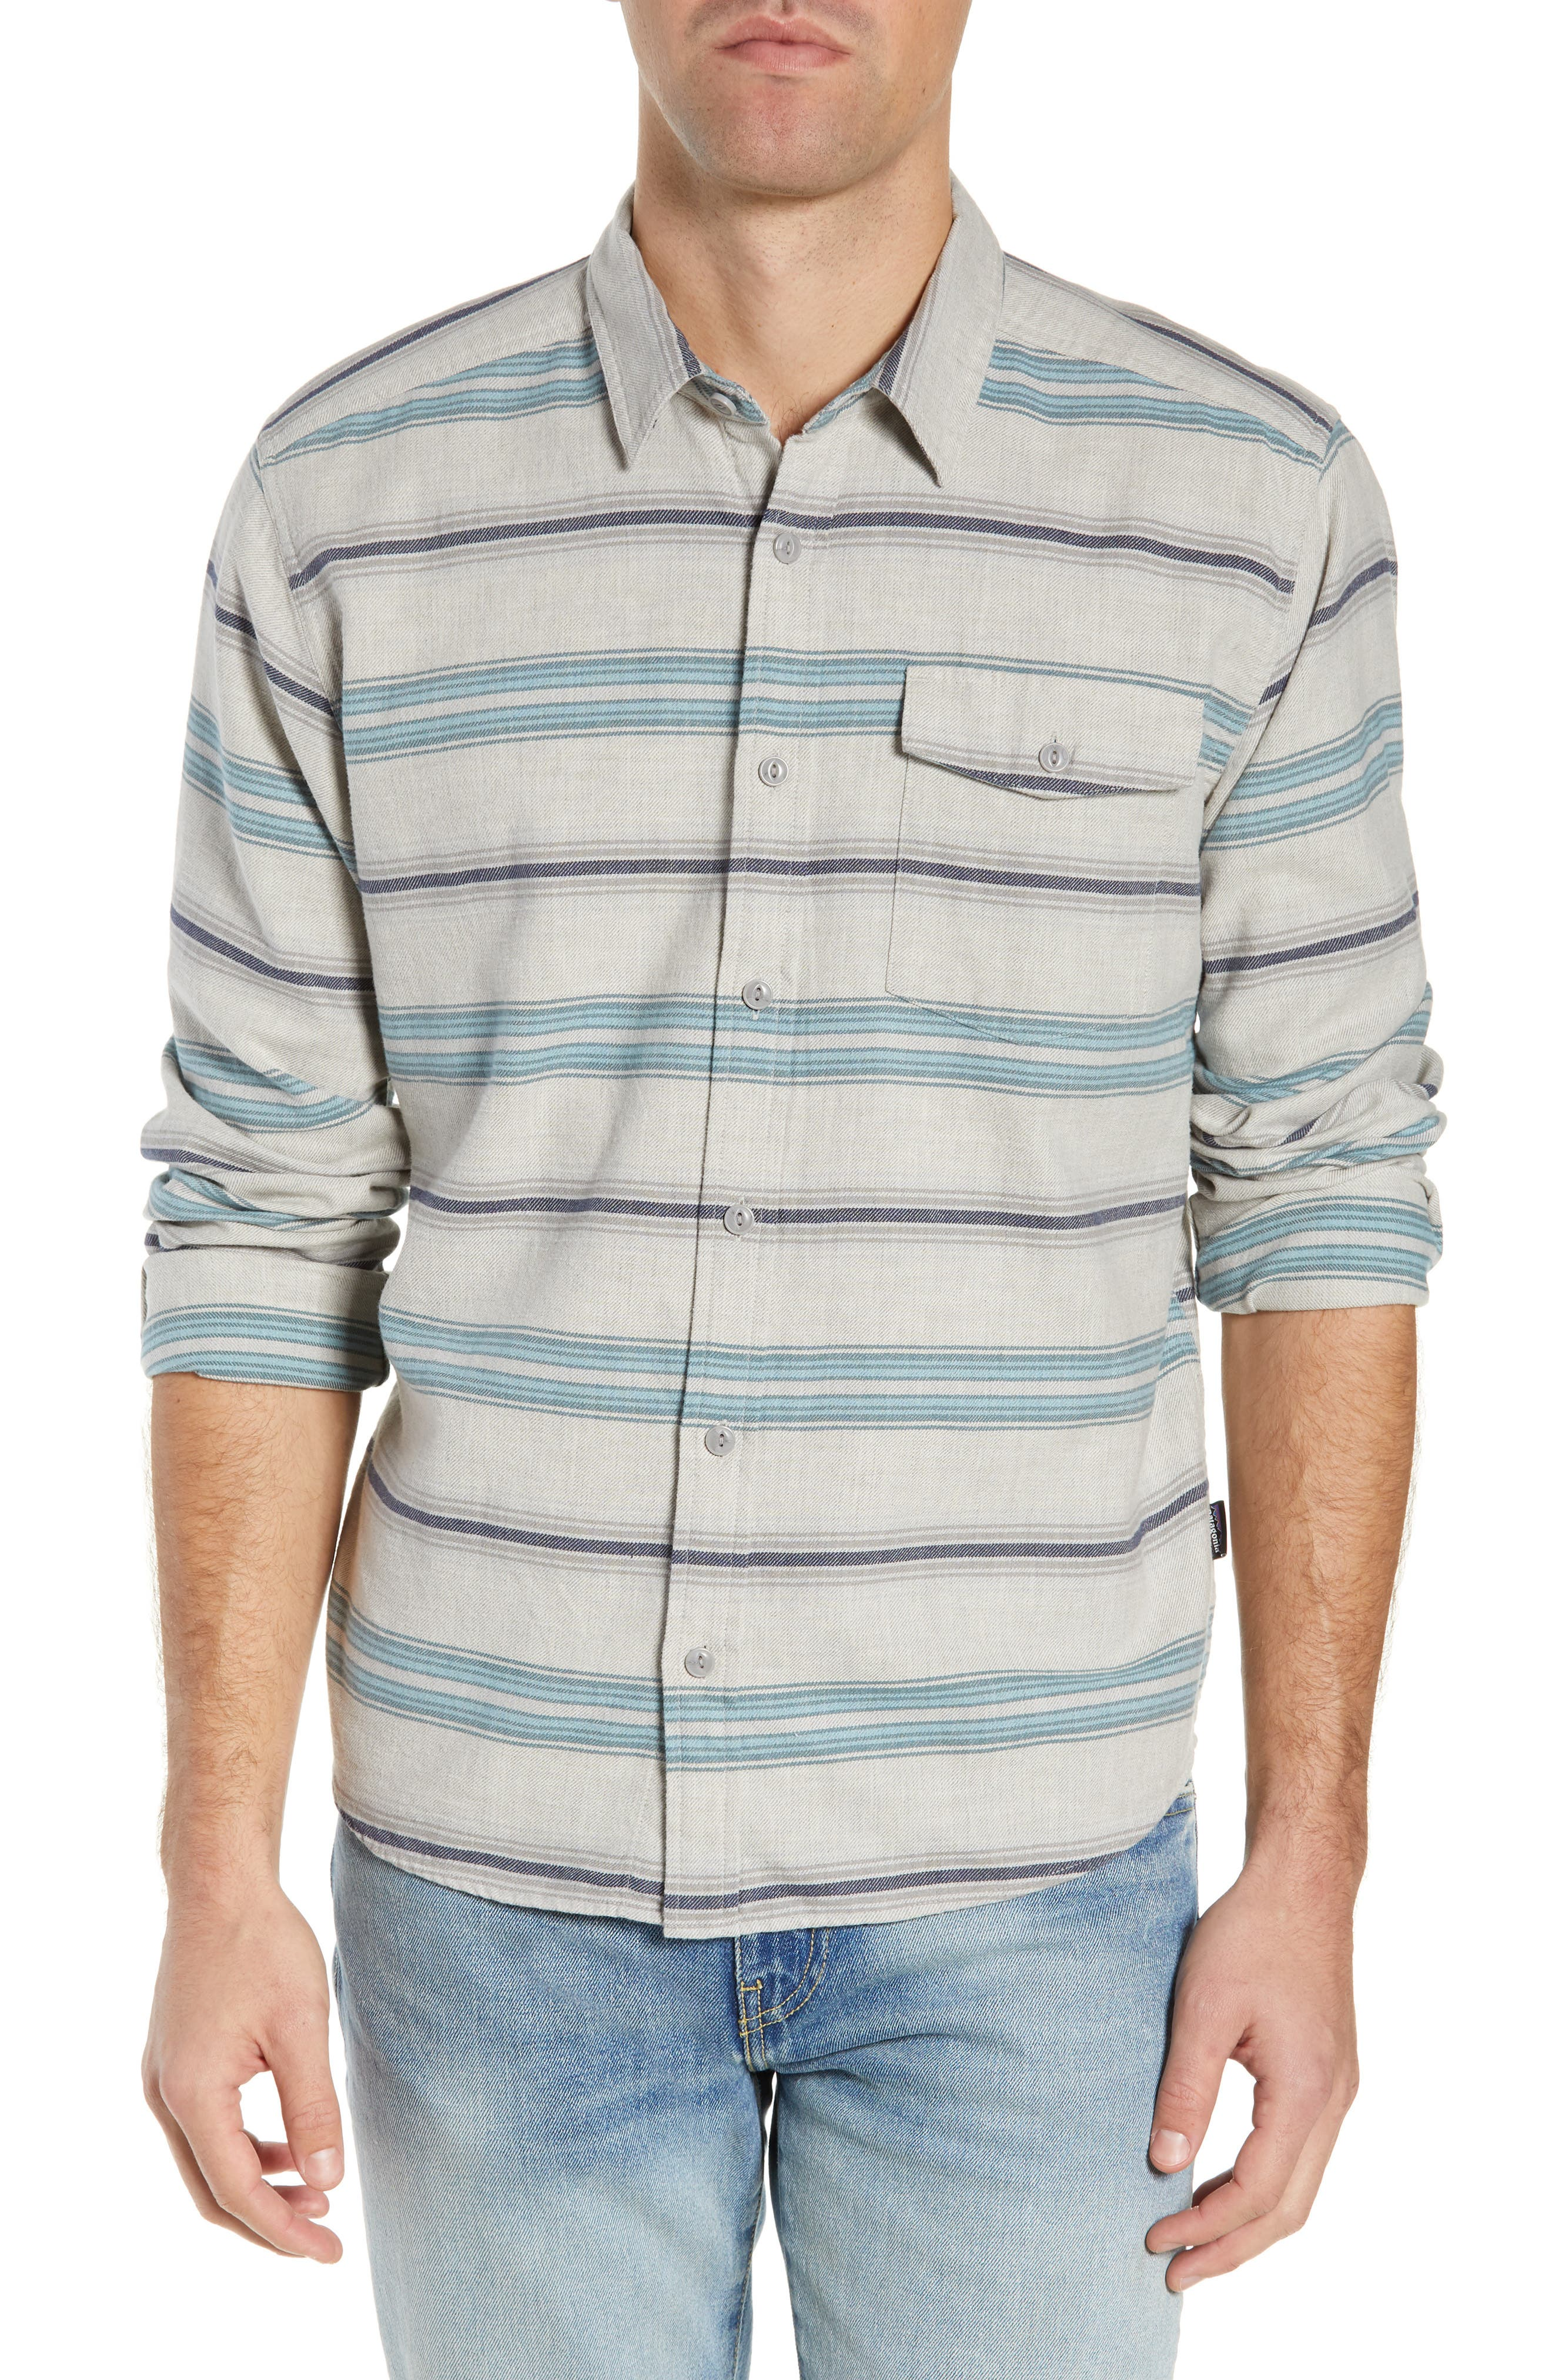 PATAGONIA Regular Fit Organic Cotton Flannel Shirt, Main, color, TARKINE STRIPE DRIFTER GREY